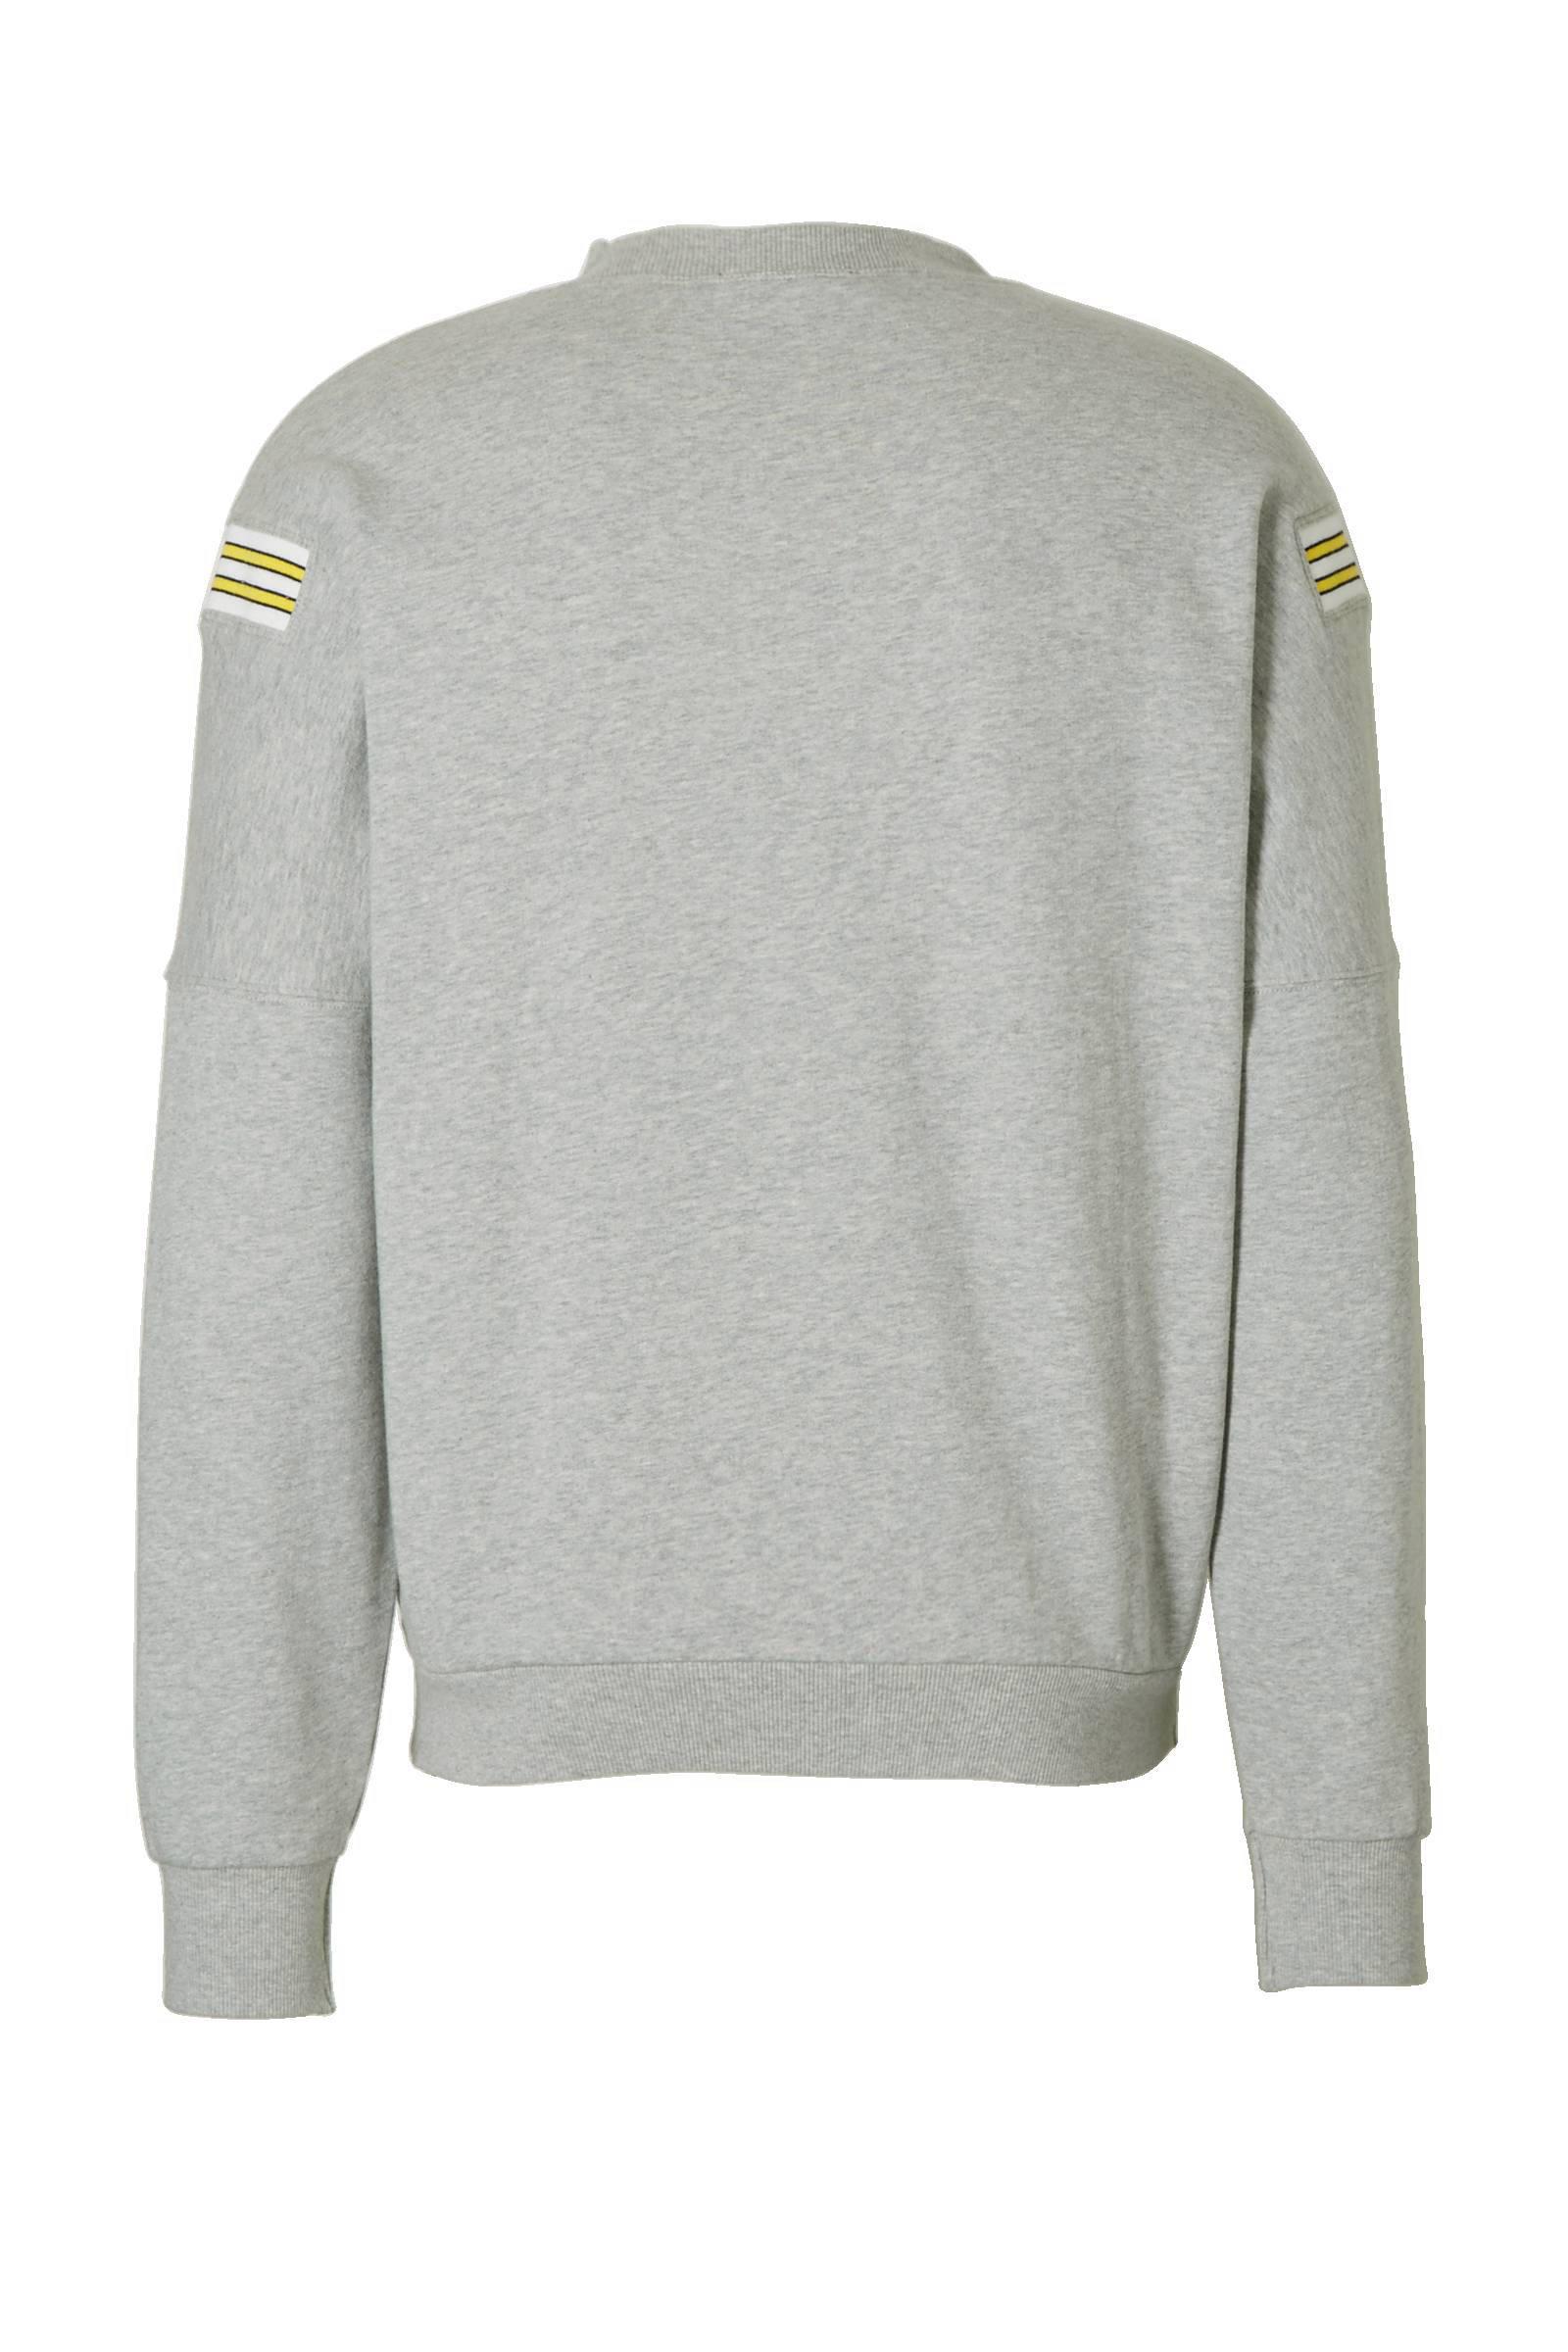 Diesel Radio Diesel sweater Felpa S S BqnHPTwq